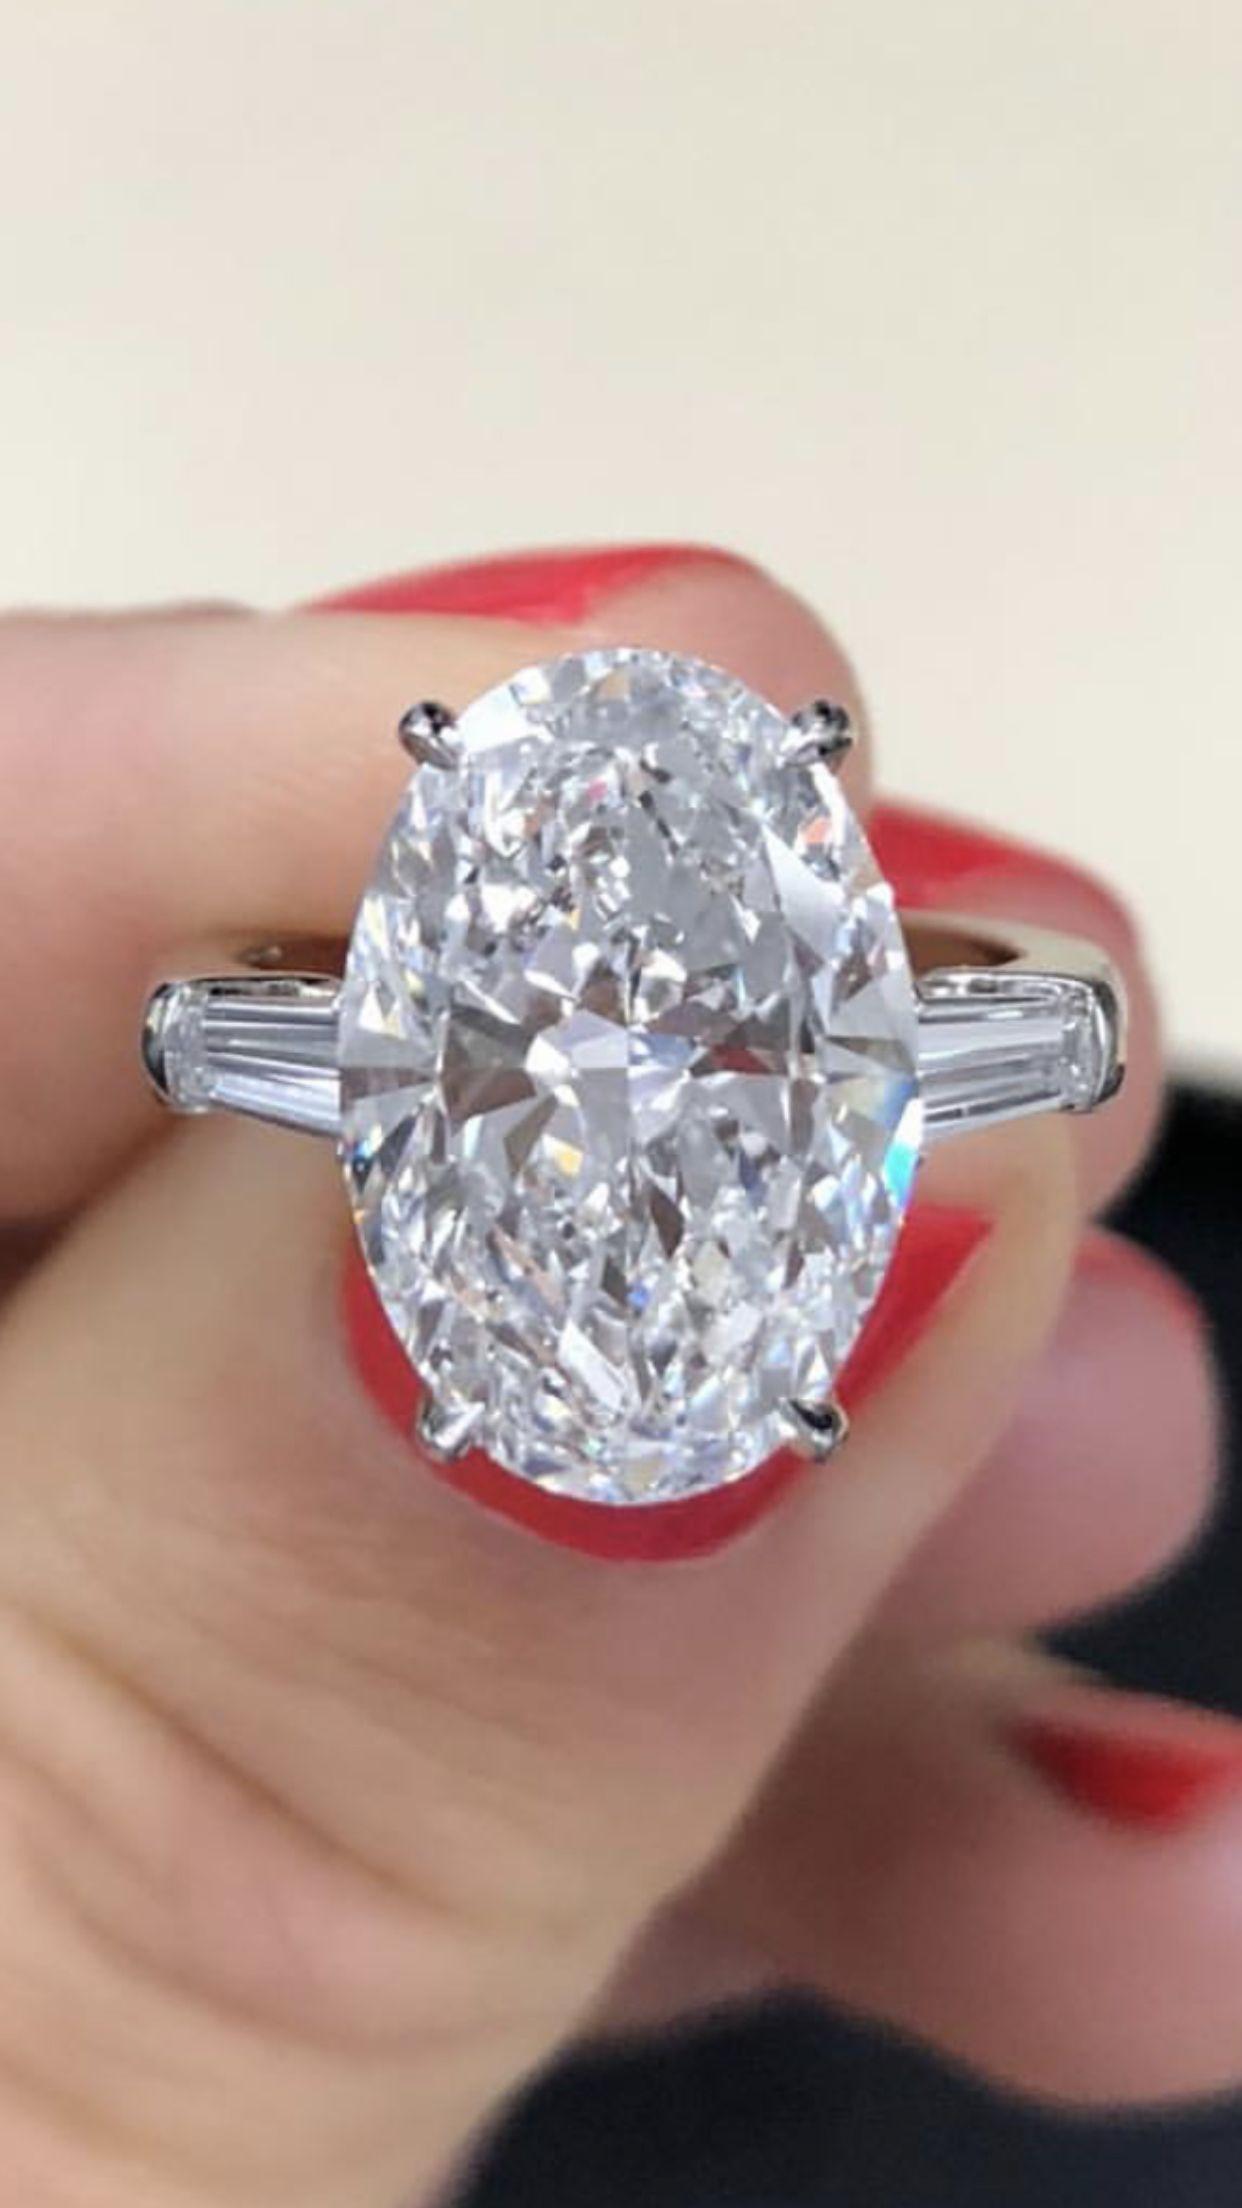 Pin by Manoj kadel on Rings in 2020 Diamond, Jewelry